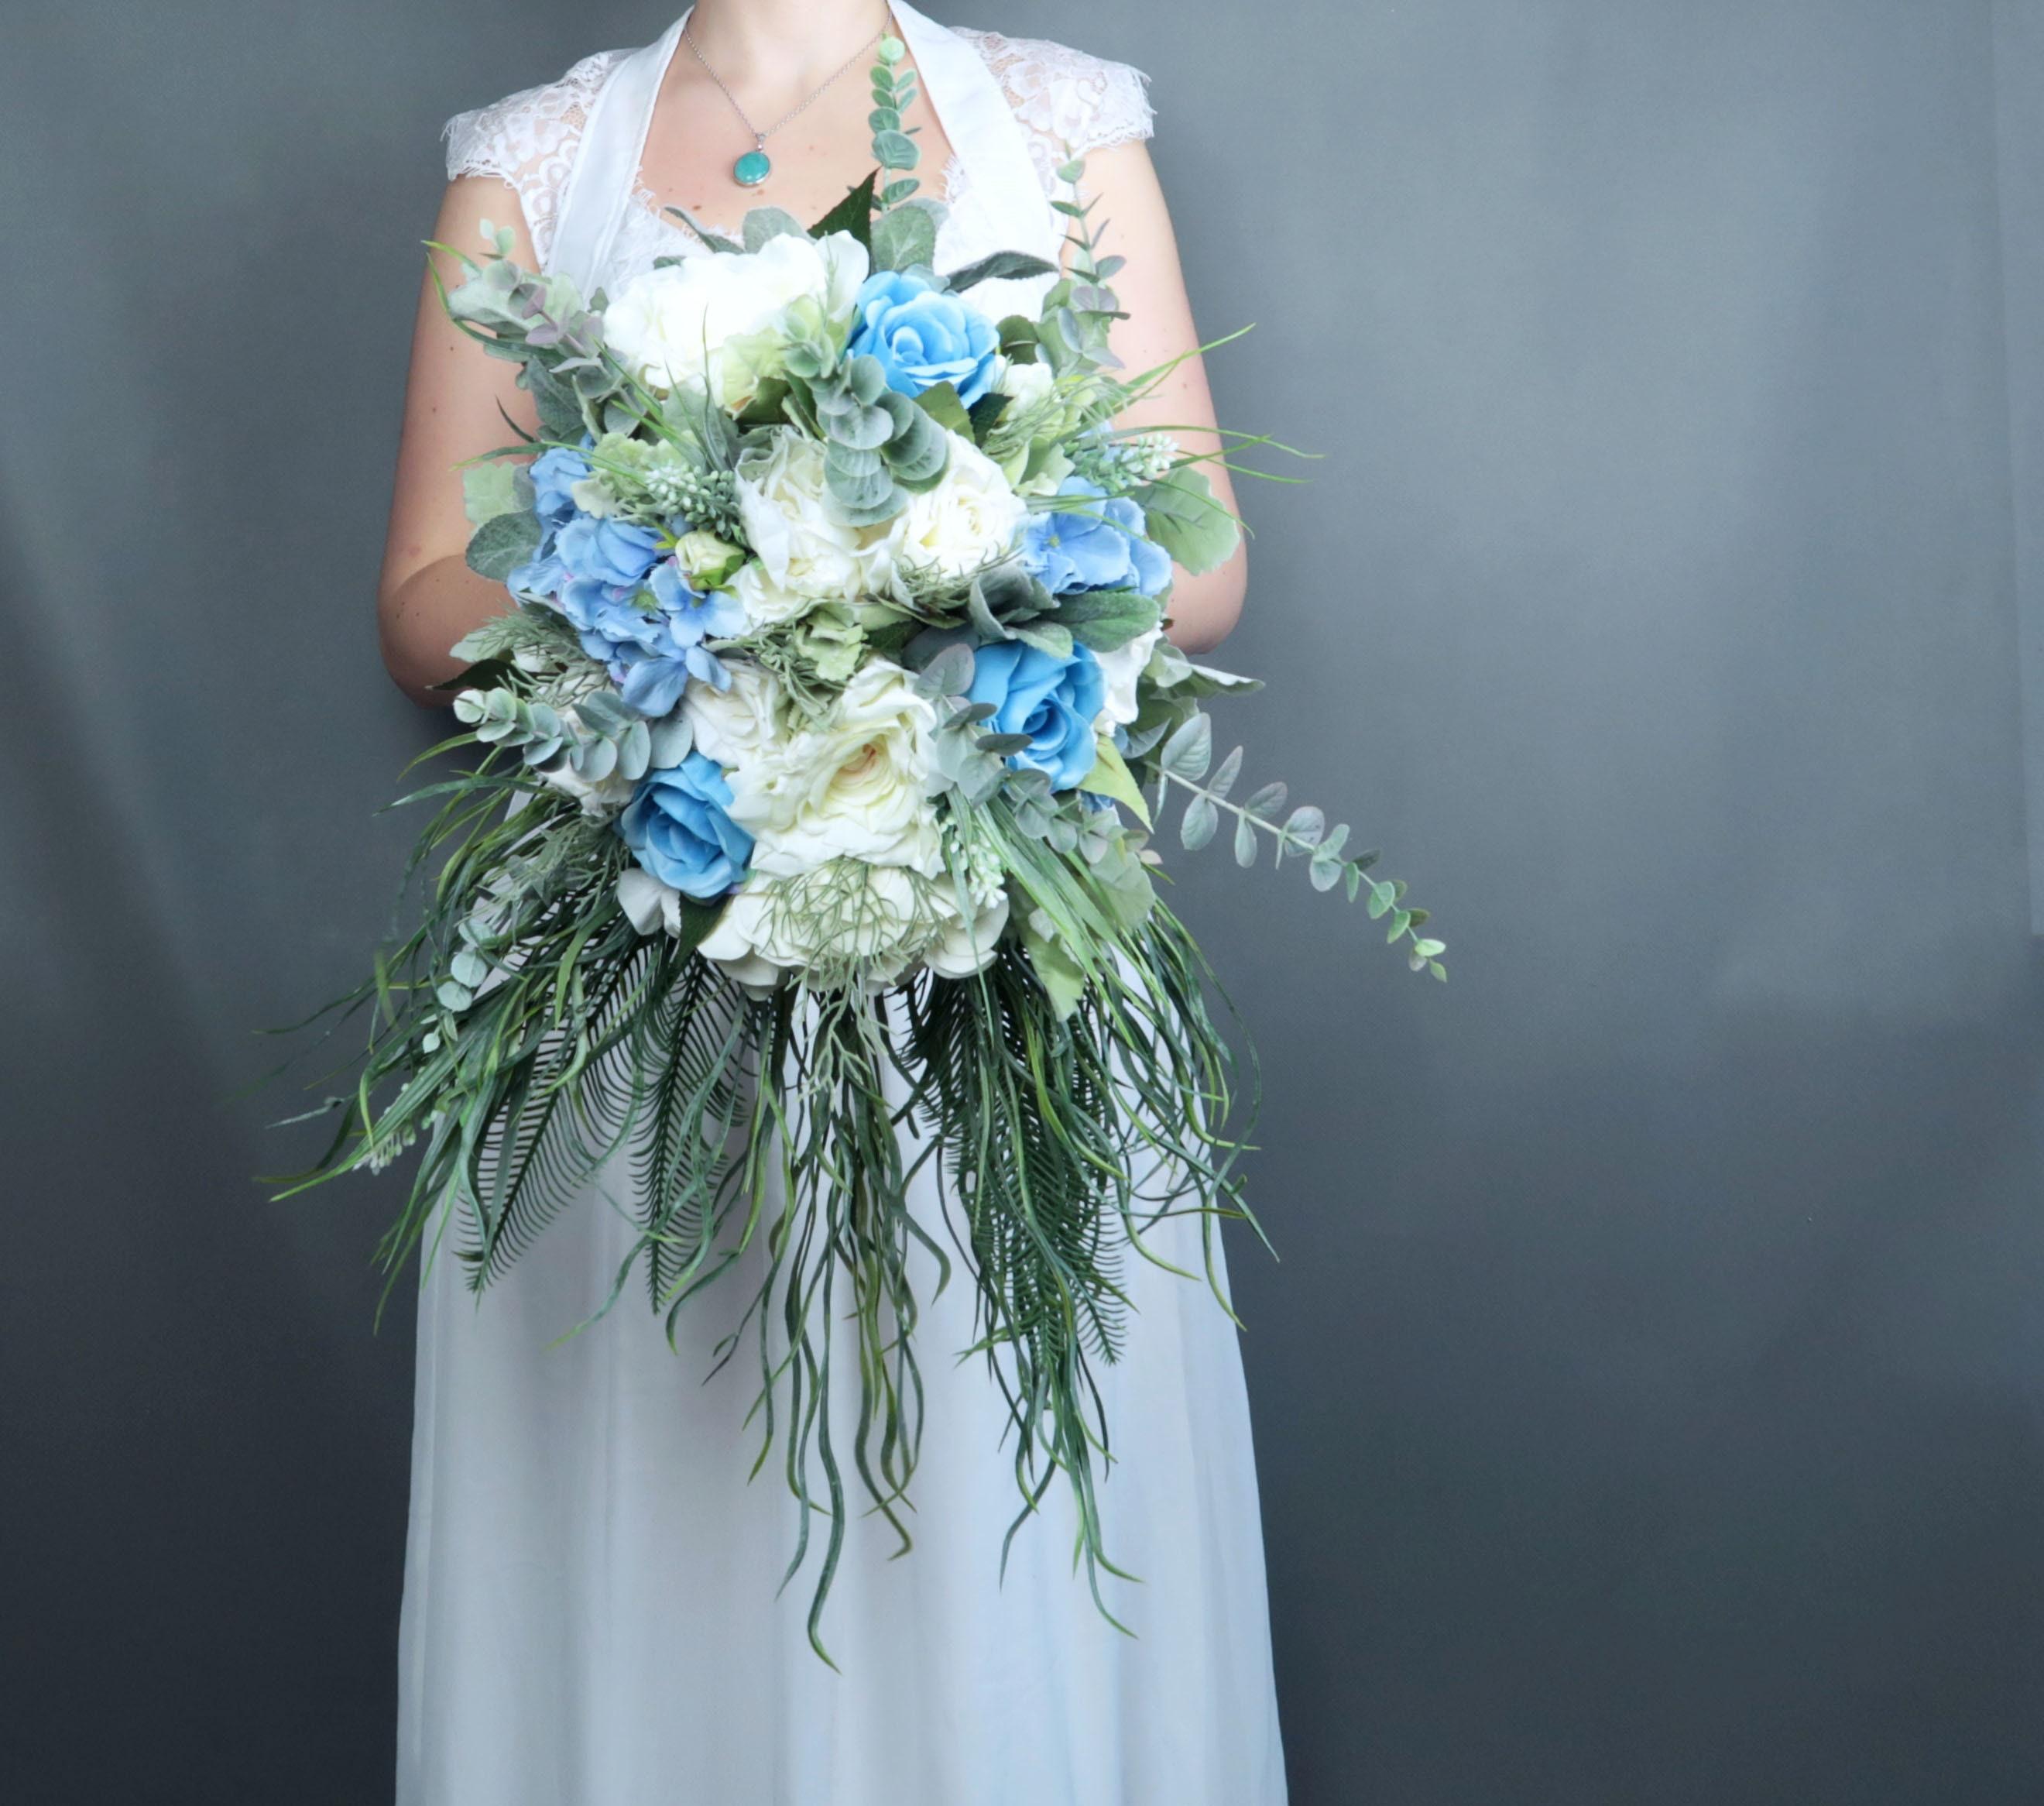 Cascading greenery pastel blue white ivory flowers bridal bouquet cascading greenery pastel blue white ivory flowers bridal bouquet best quality dusty miller roses hydrangea eucalyptus southwestern wedding mightylinksfo